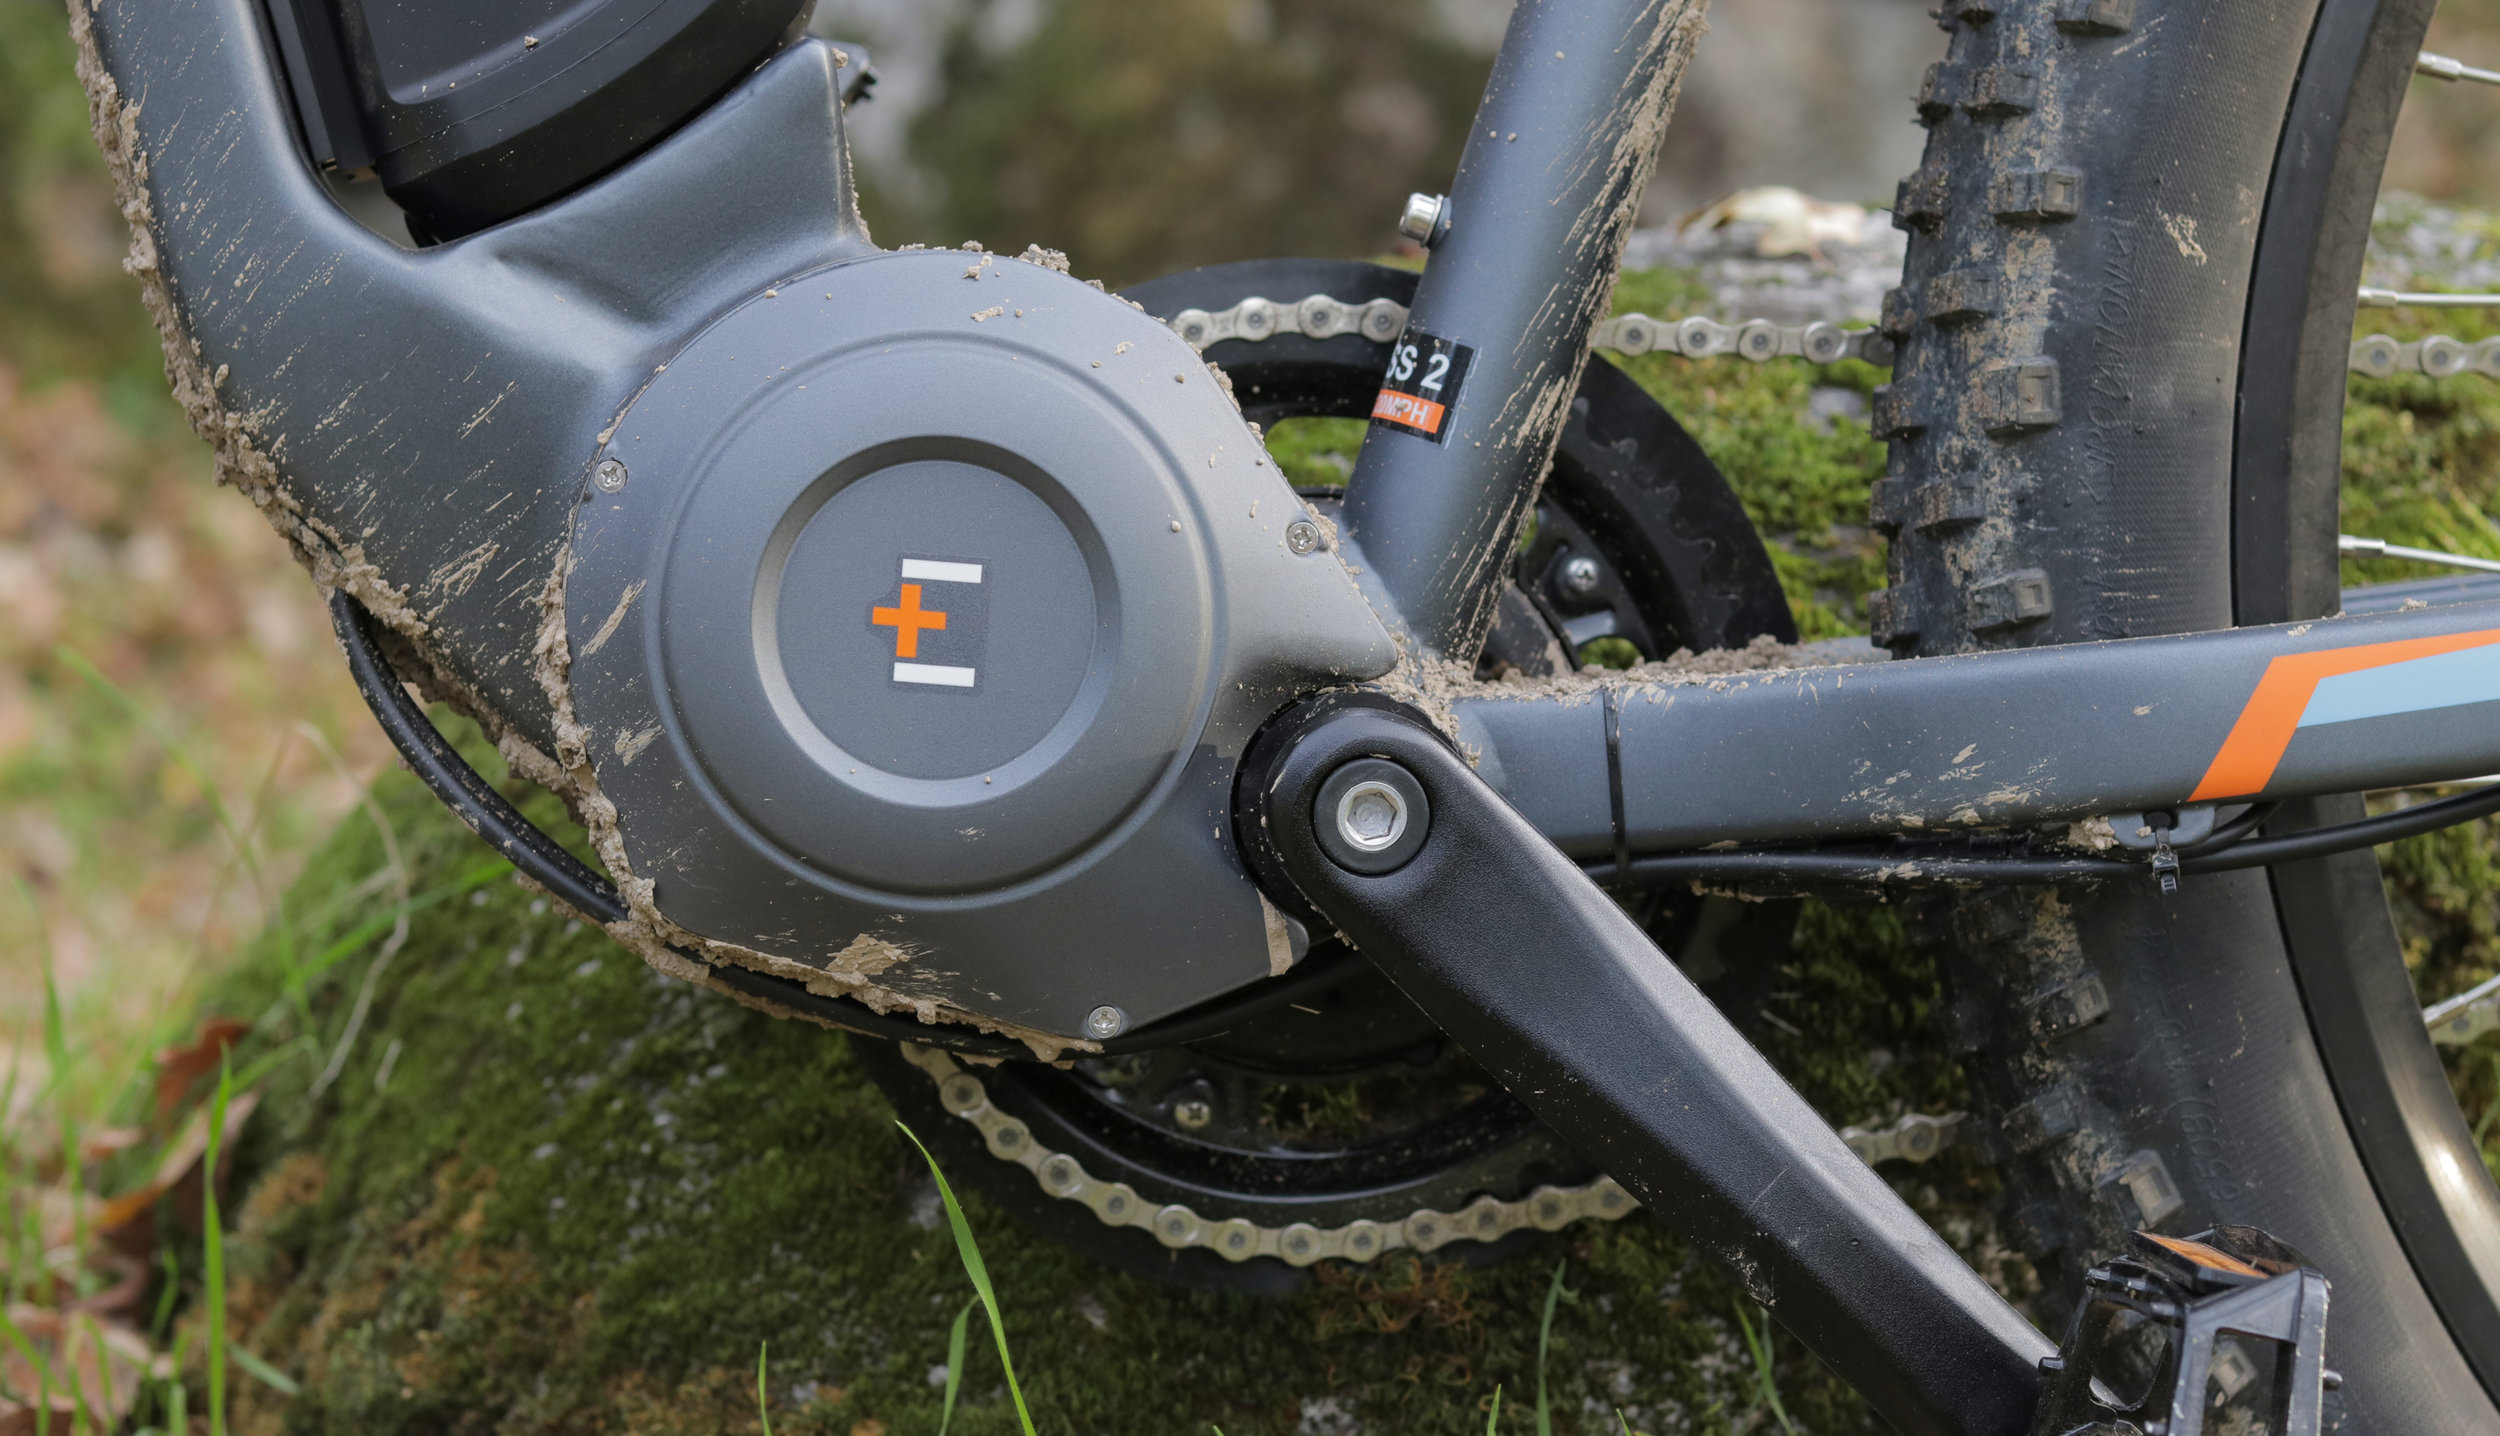 electrified-reviews-evelo-delta-electric-bike-review-bafang-motor.jpg